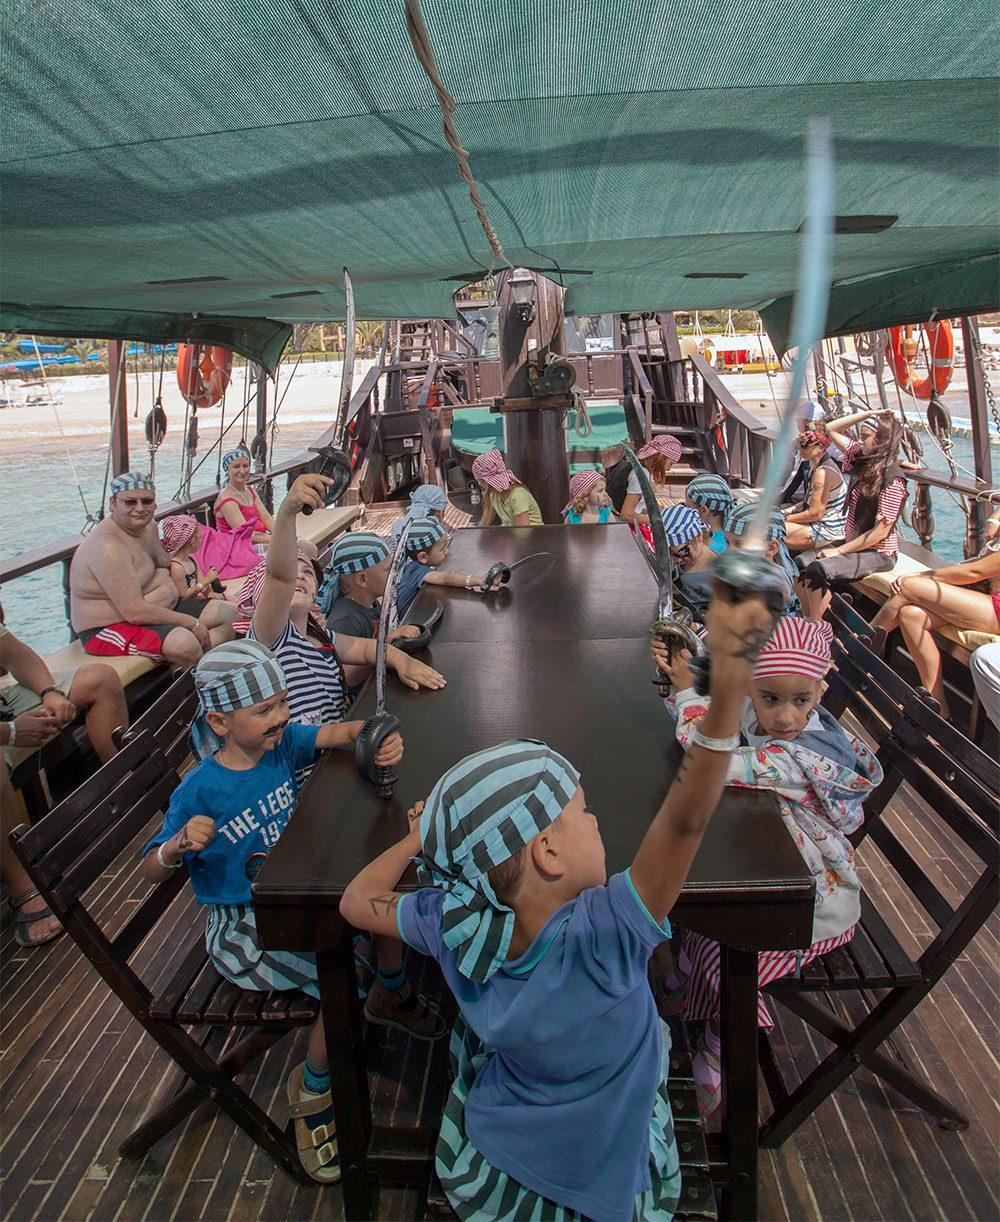 детский клуб отеля Pirate's Beach Club